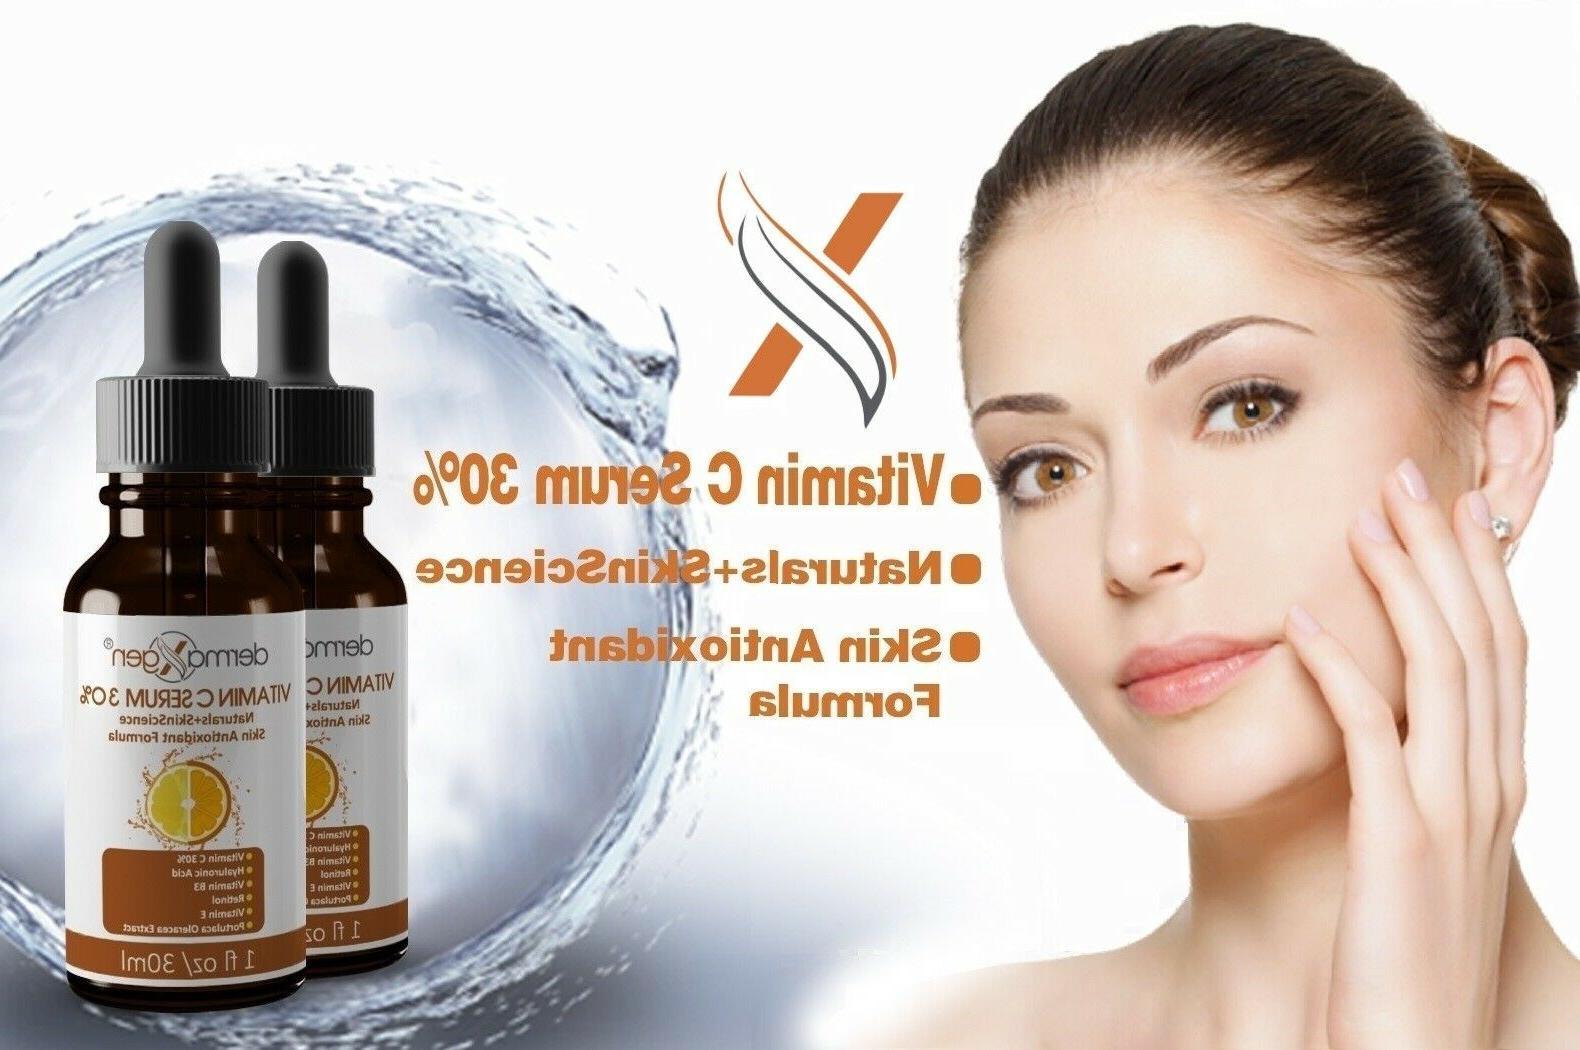 dermaXgen® Pure Vitamin Acid Antioxidant